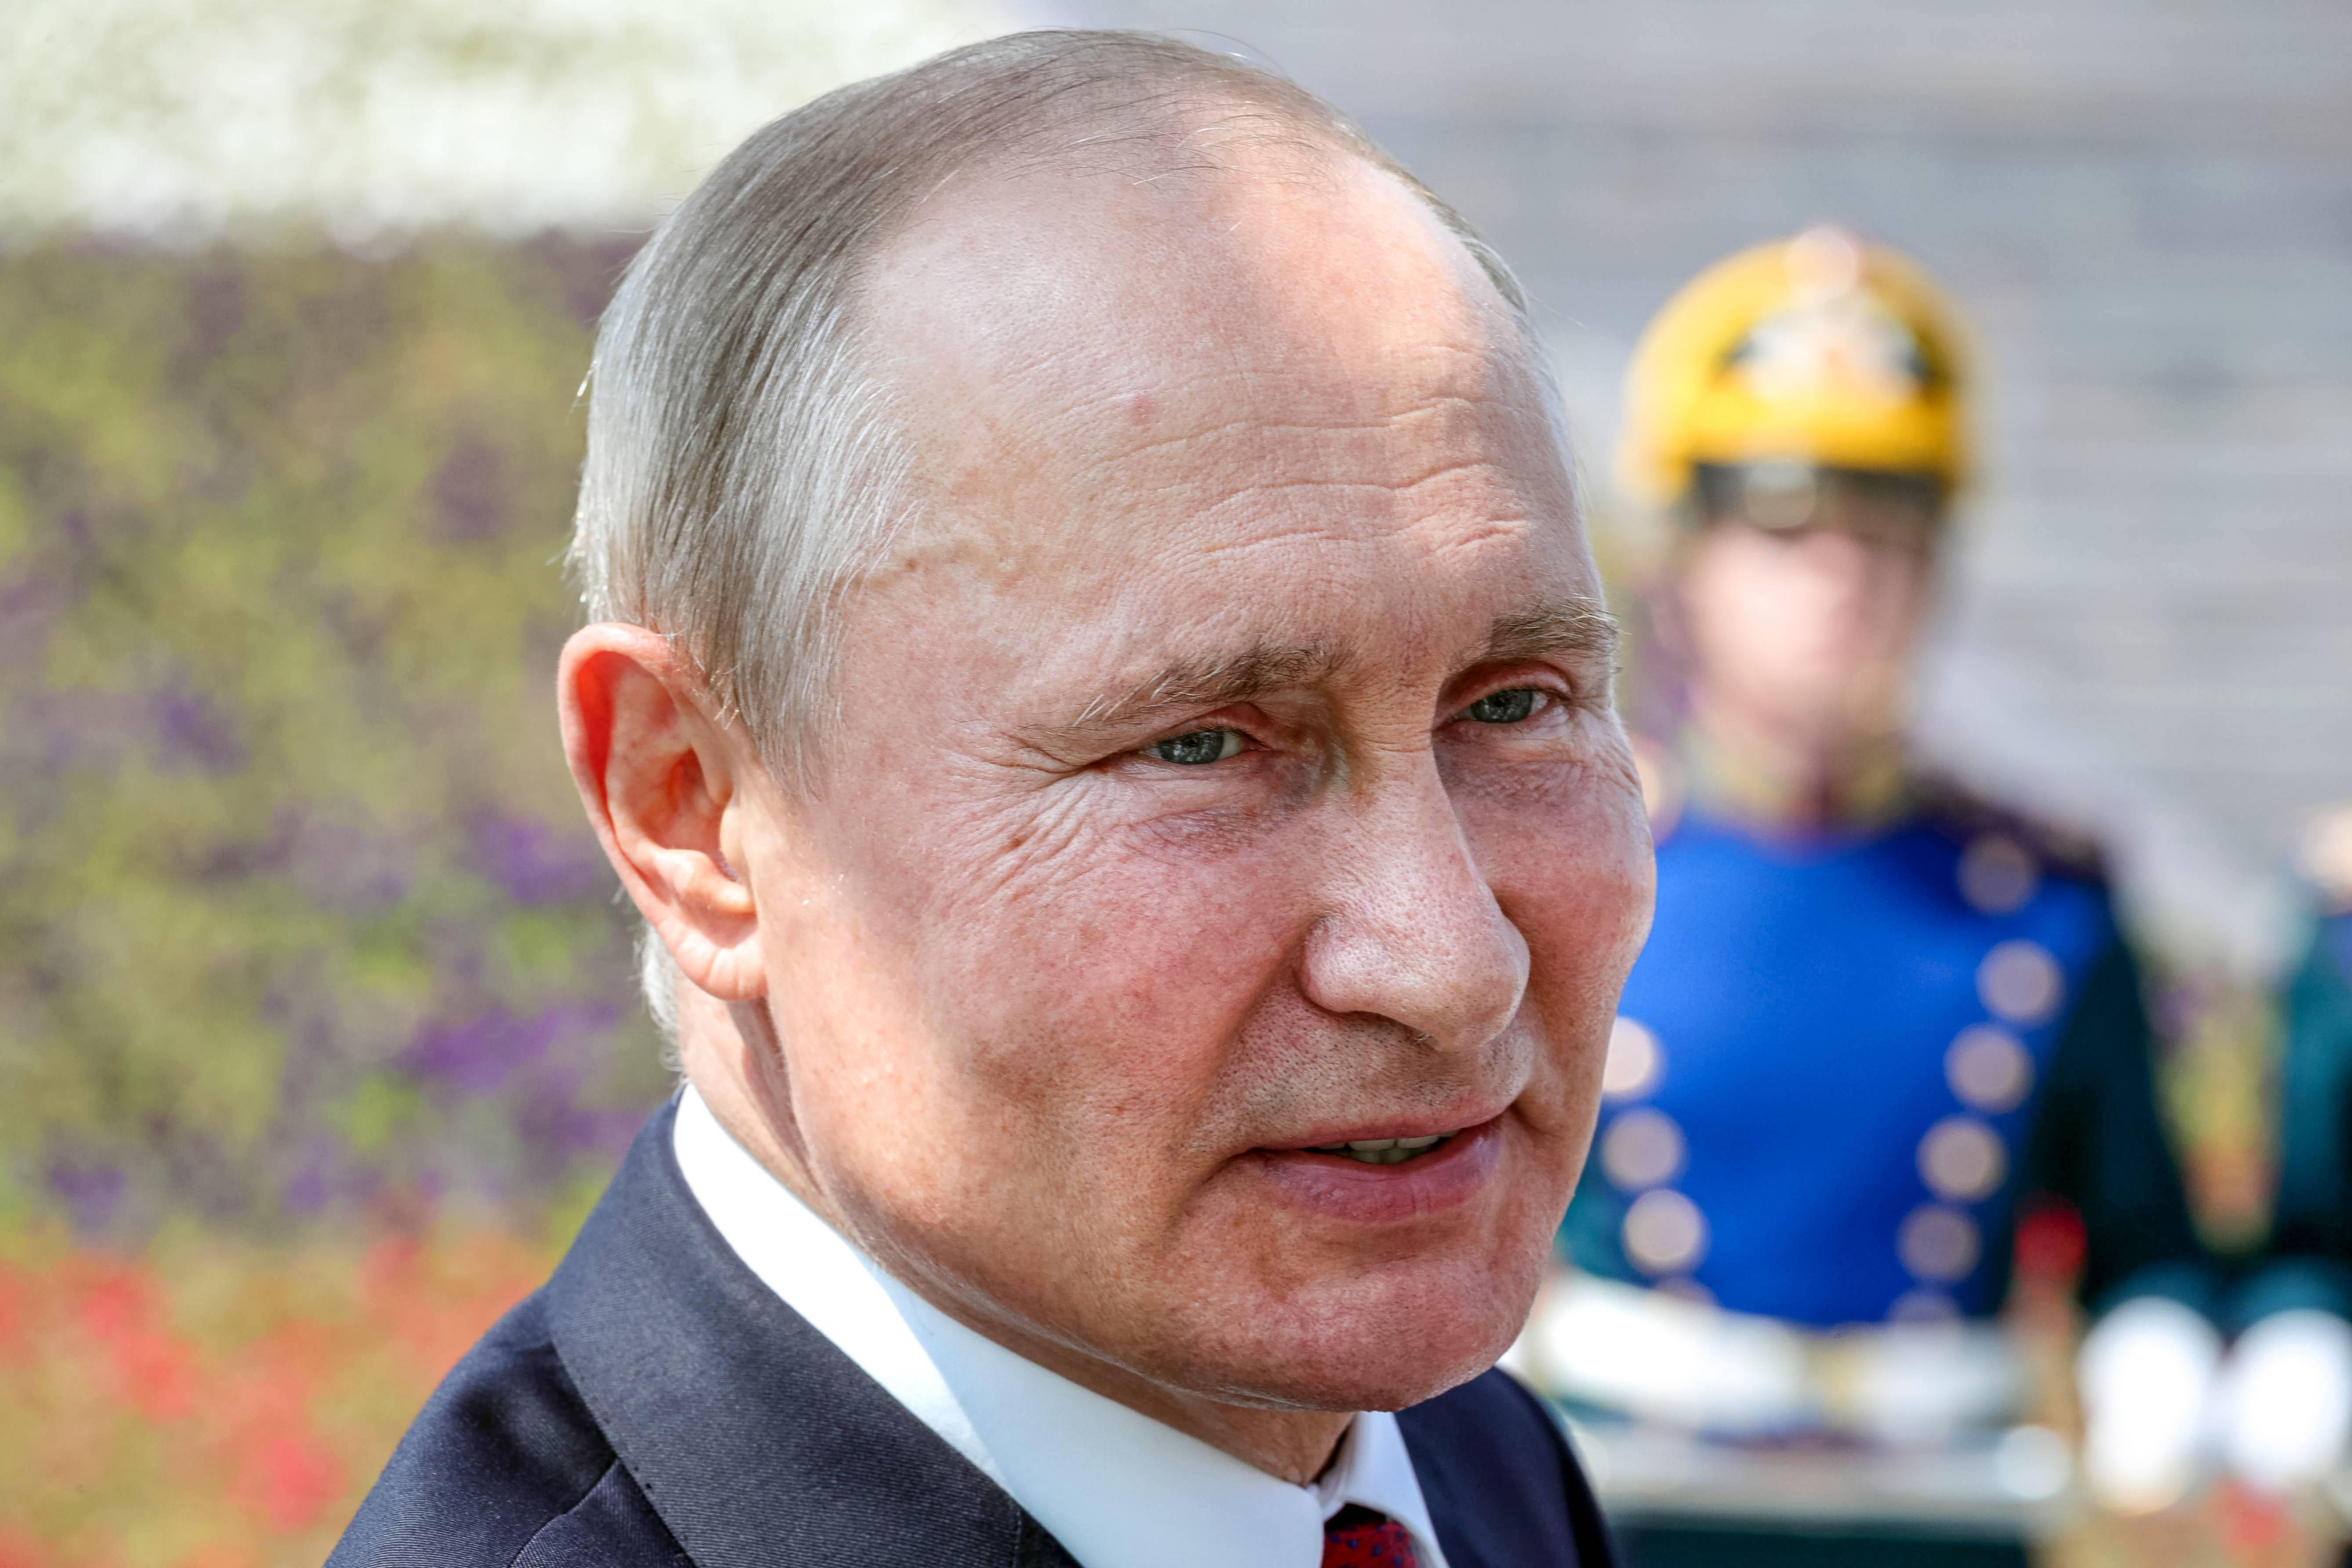 Presidente russo, Vladimir Putin   FOTO: Mikhail Klimentyev/SPUTNIK/AFP